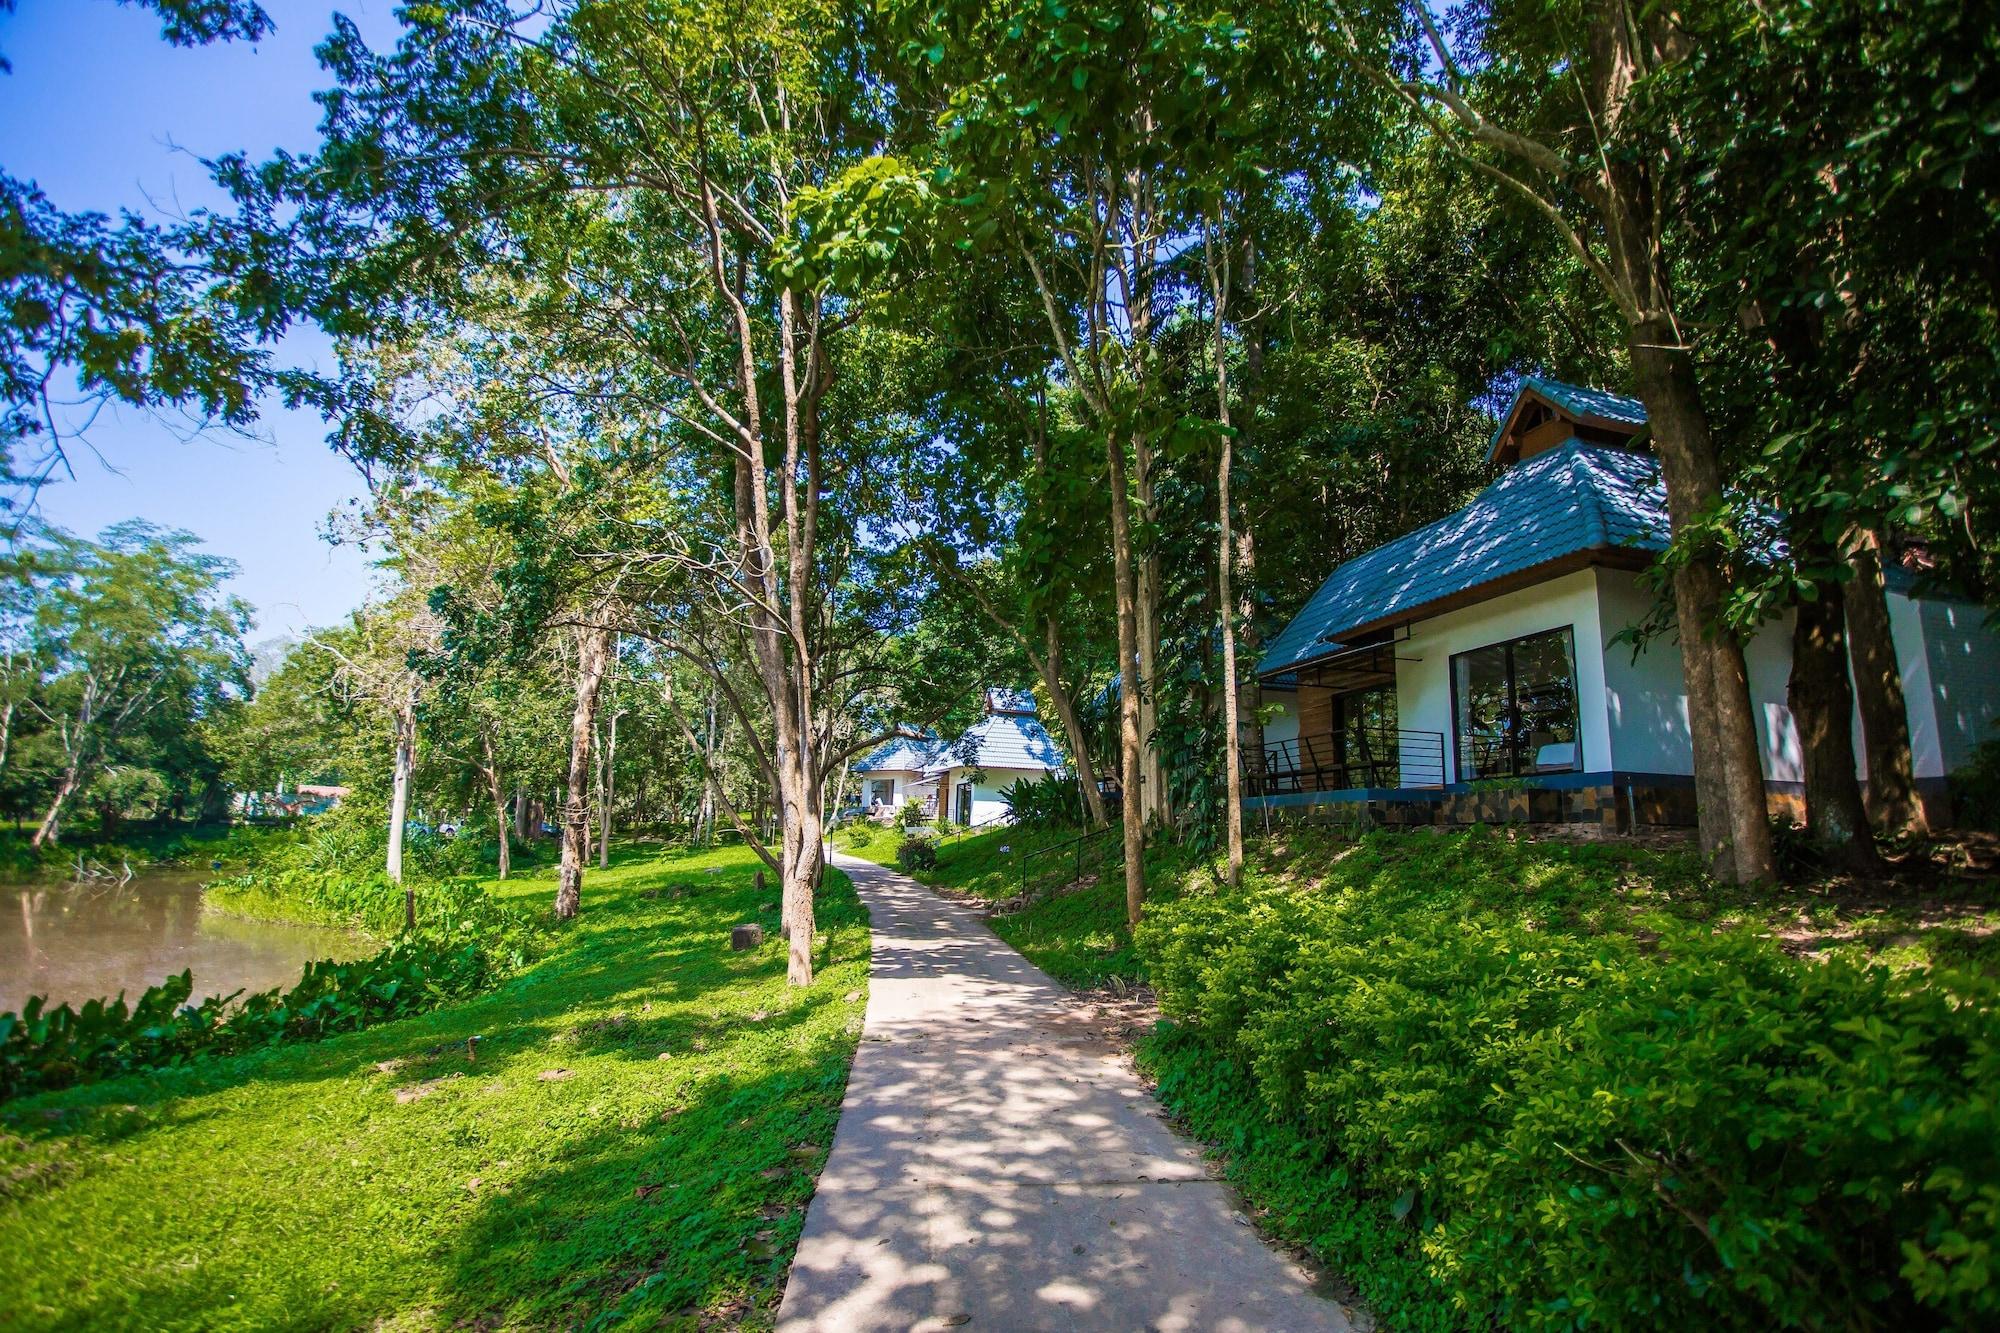 Sappraiwan Elephant Resort & Sanctuary, Wang Thong